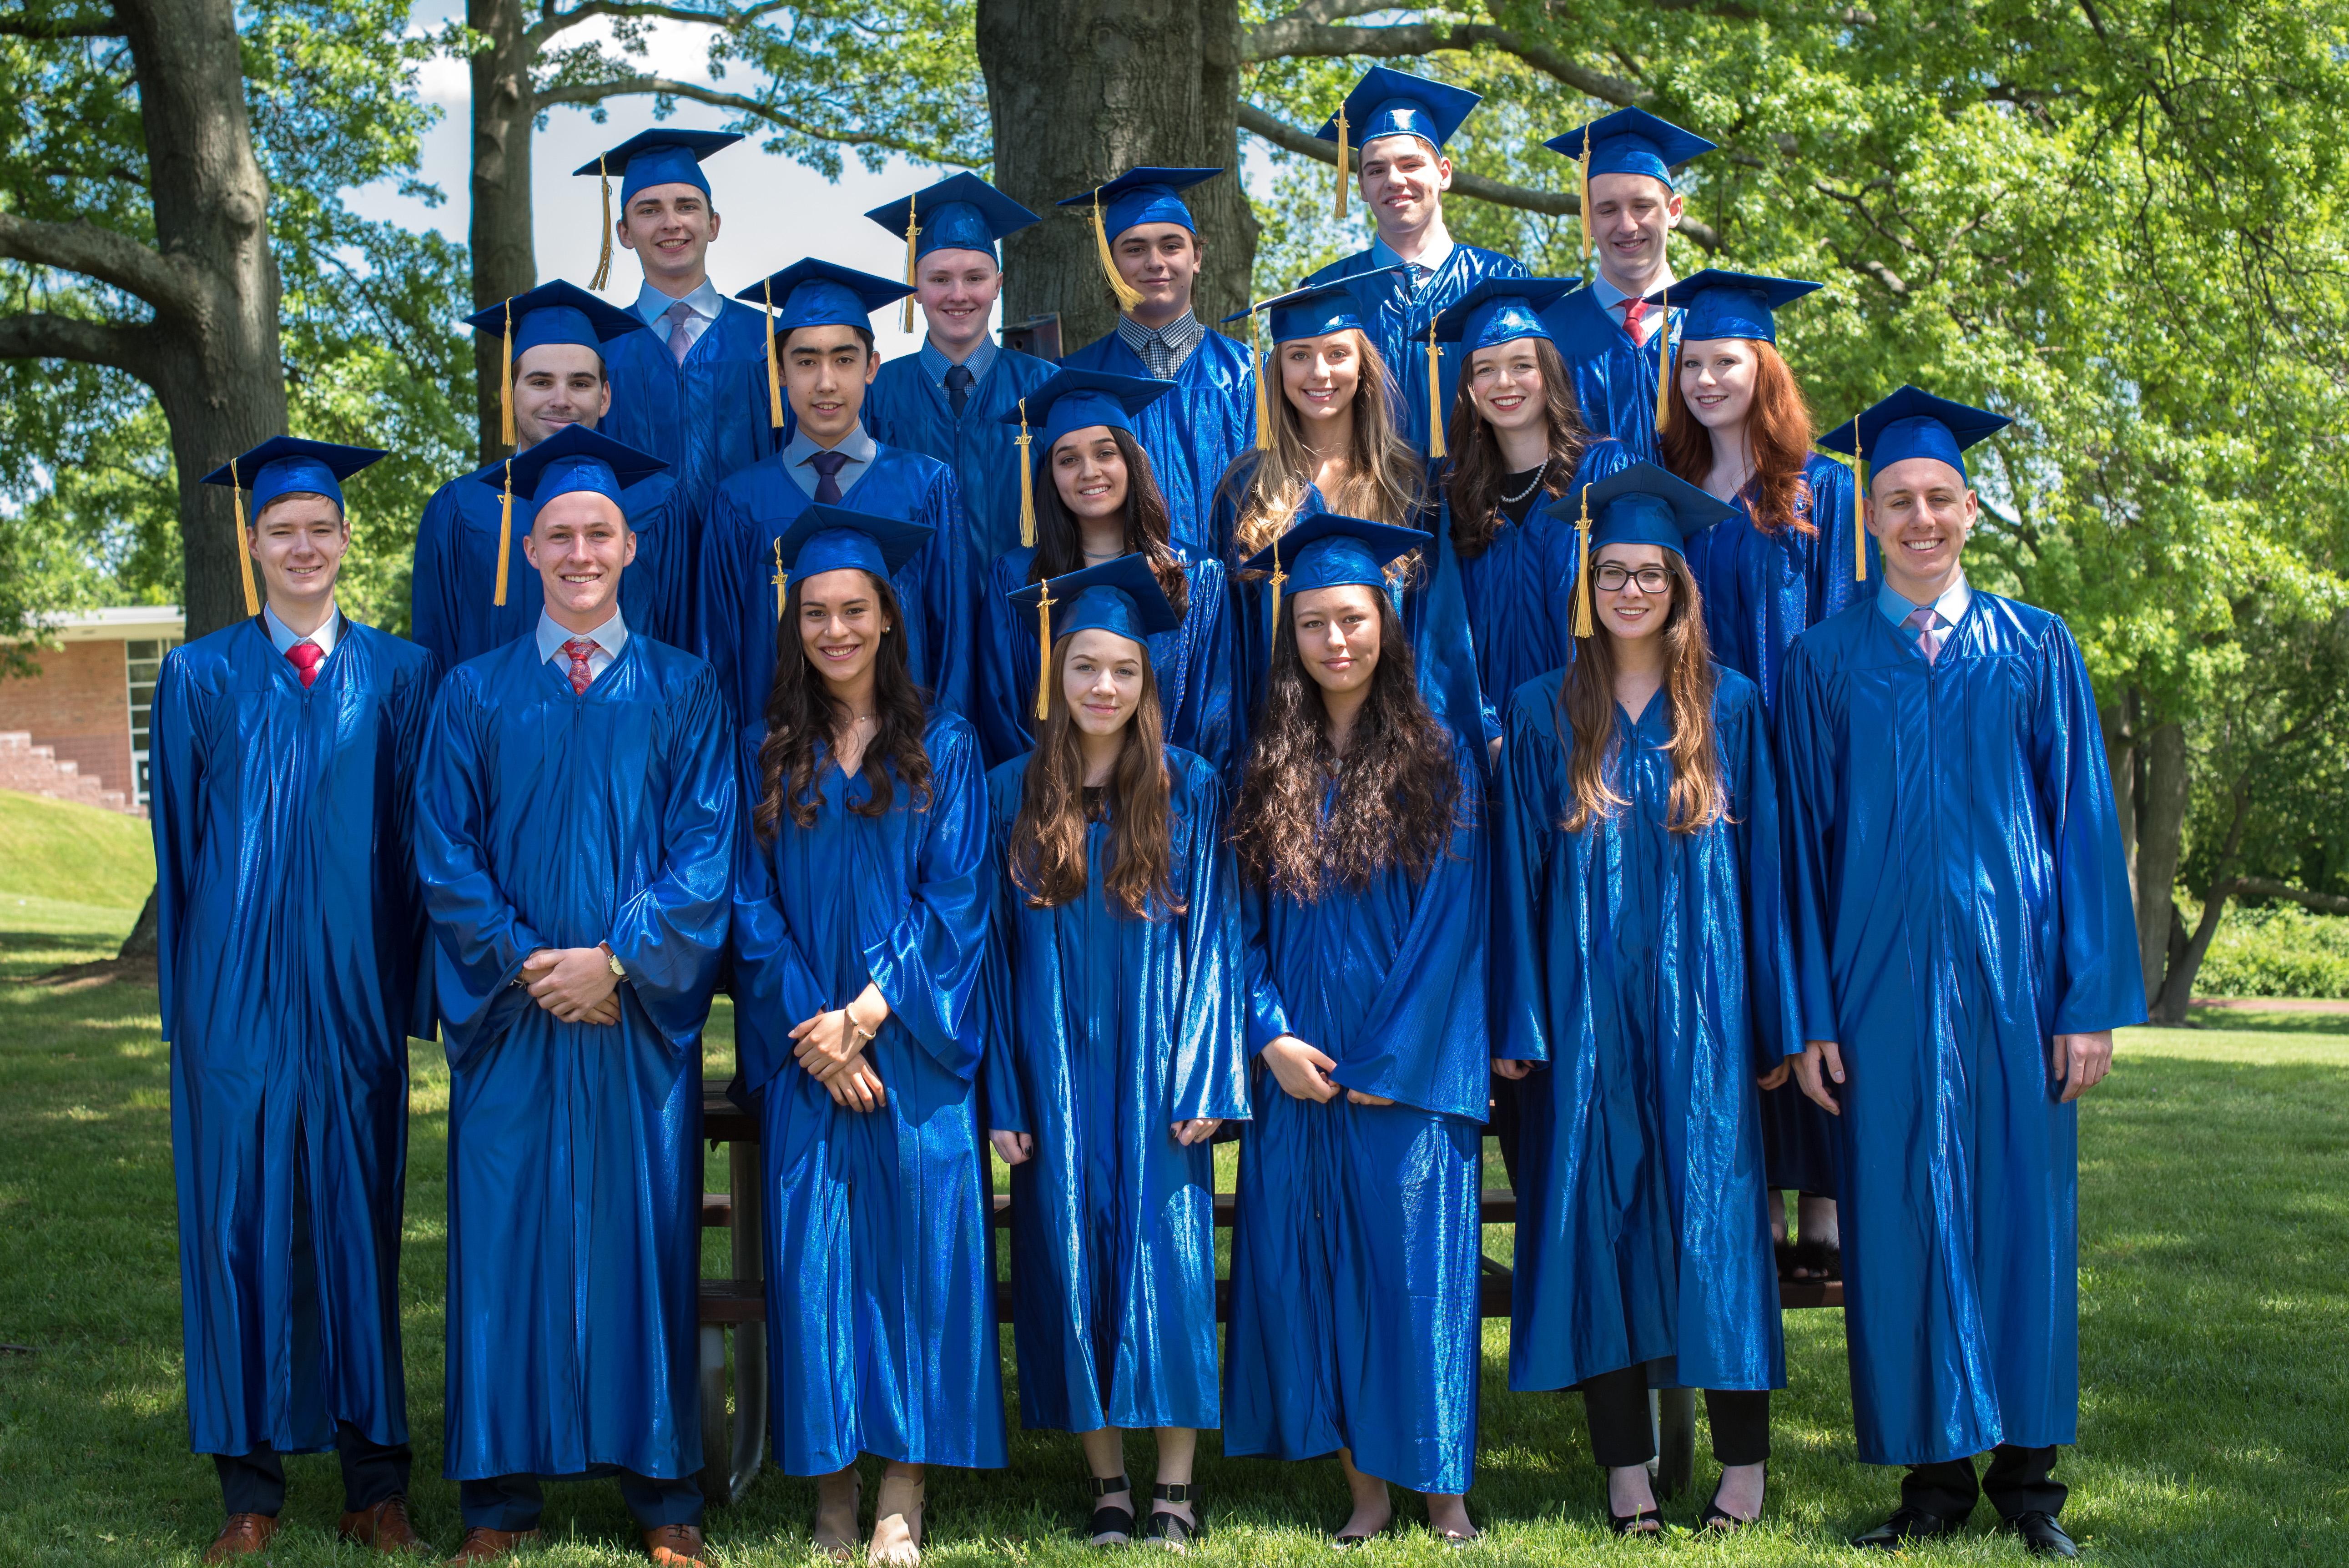 German International School of New York students participate in 2017 graduation ceremony. (Courtesy of German International School of New York)